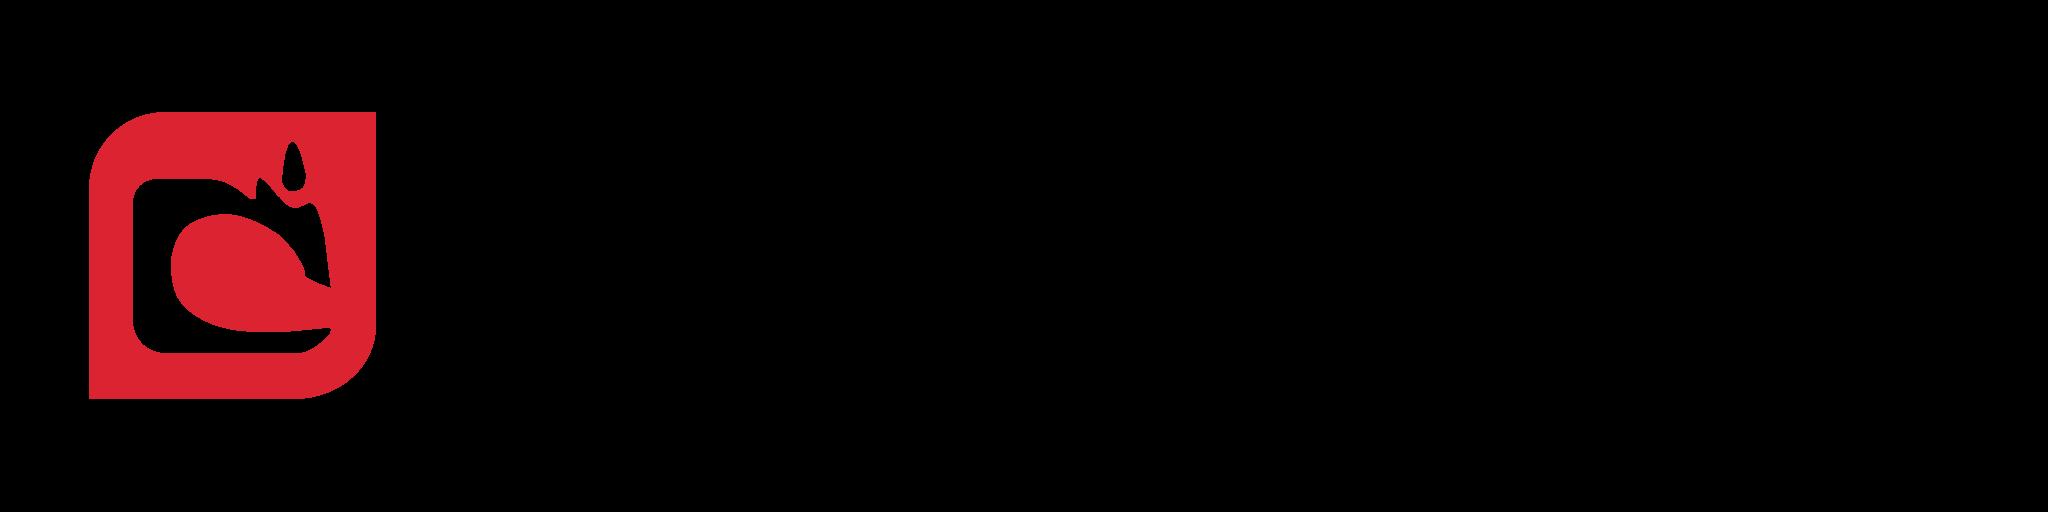 ZTc6rPR